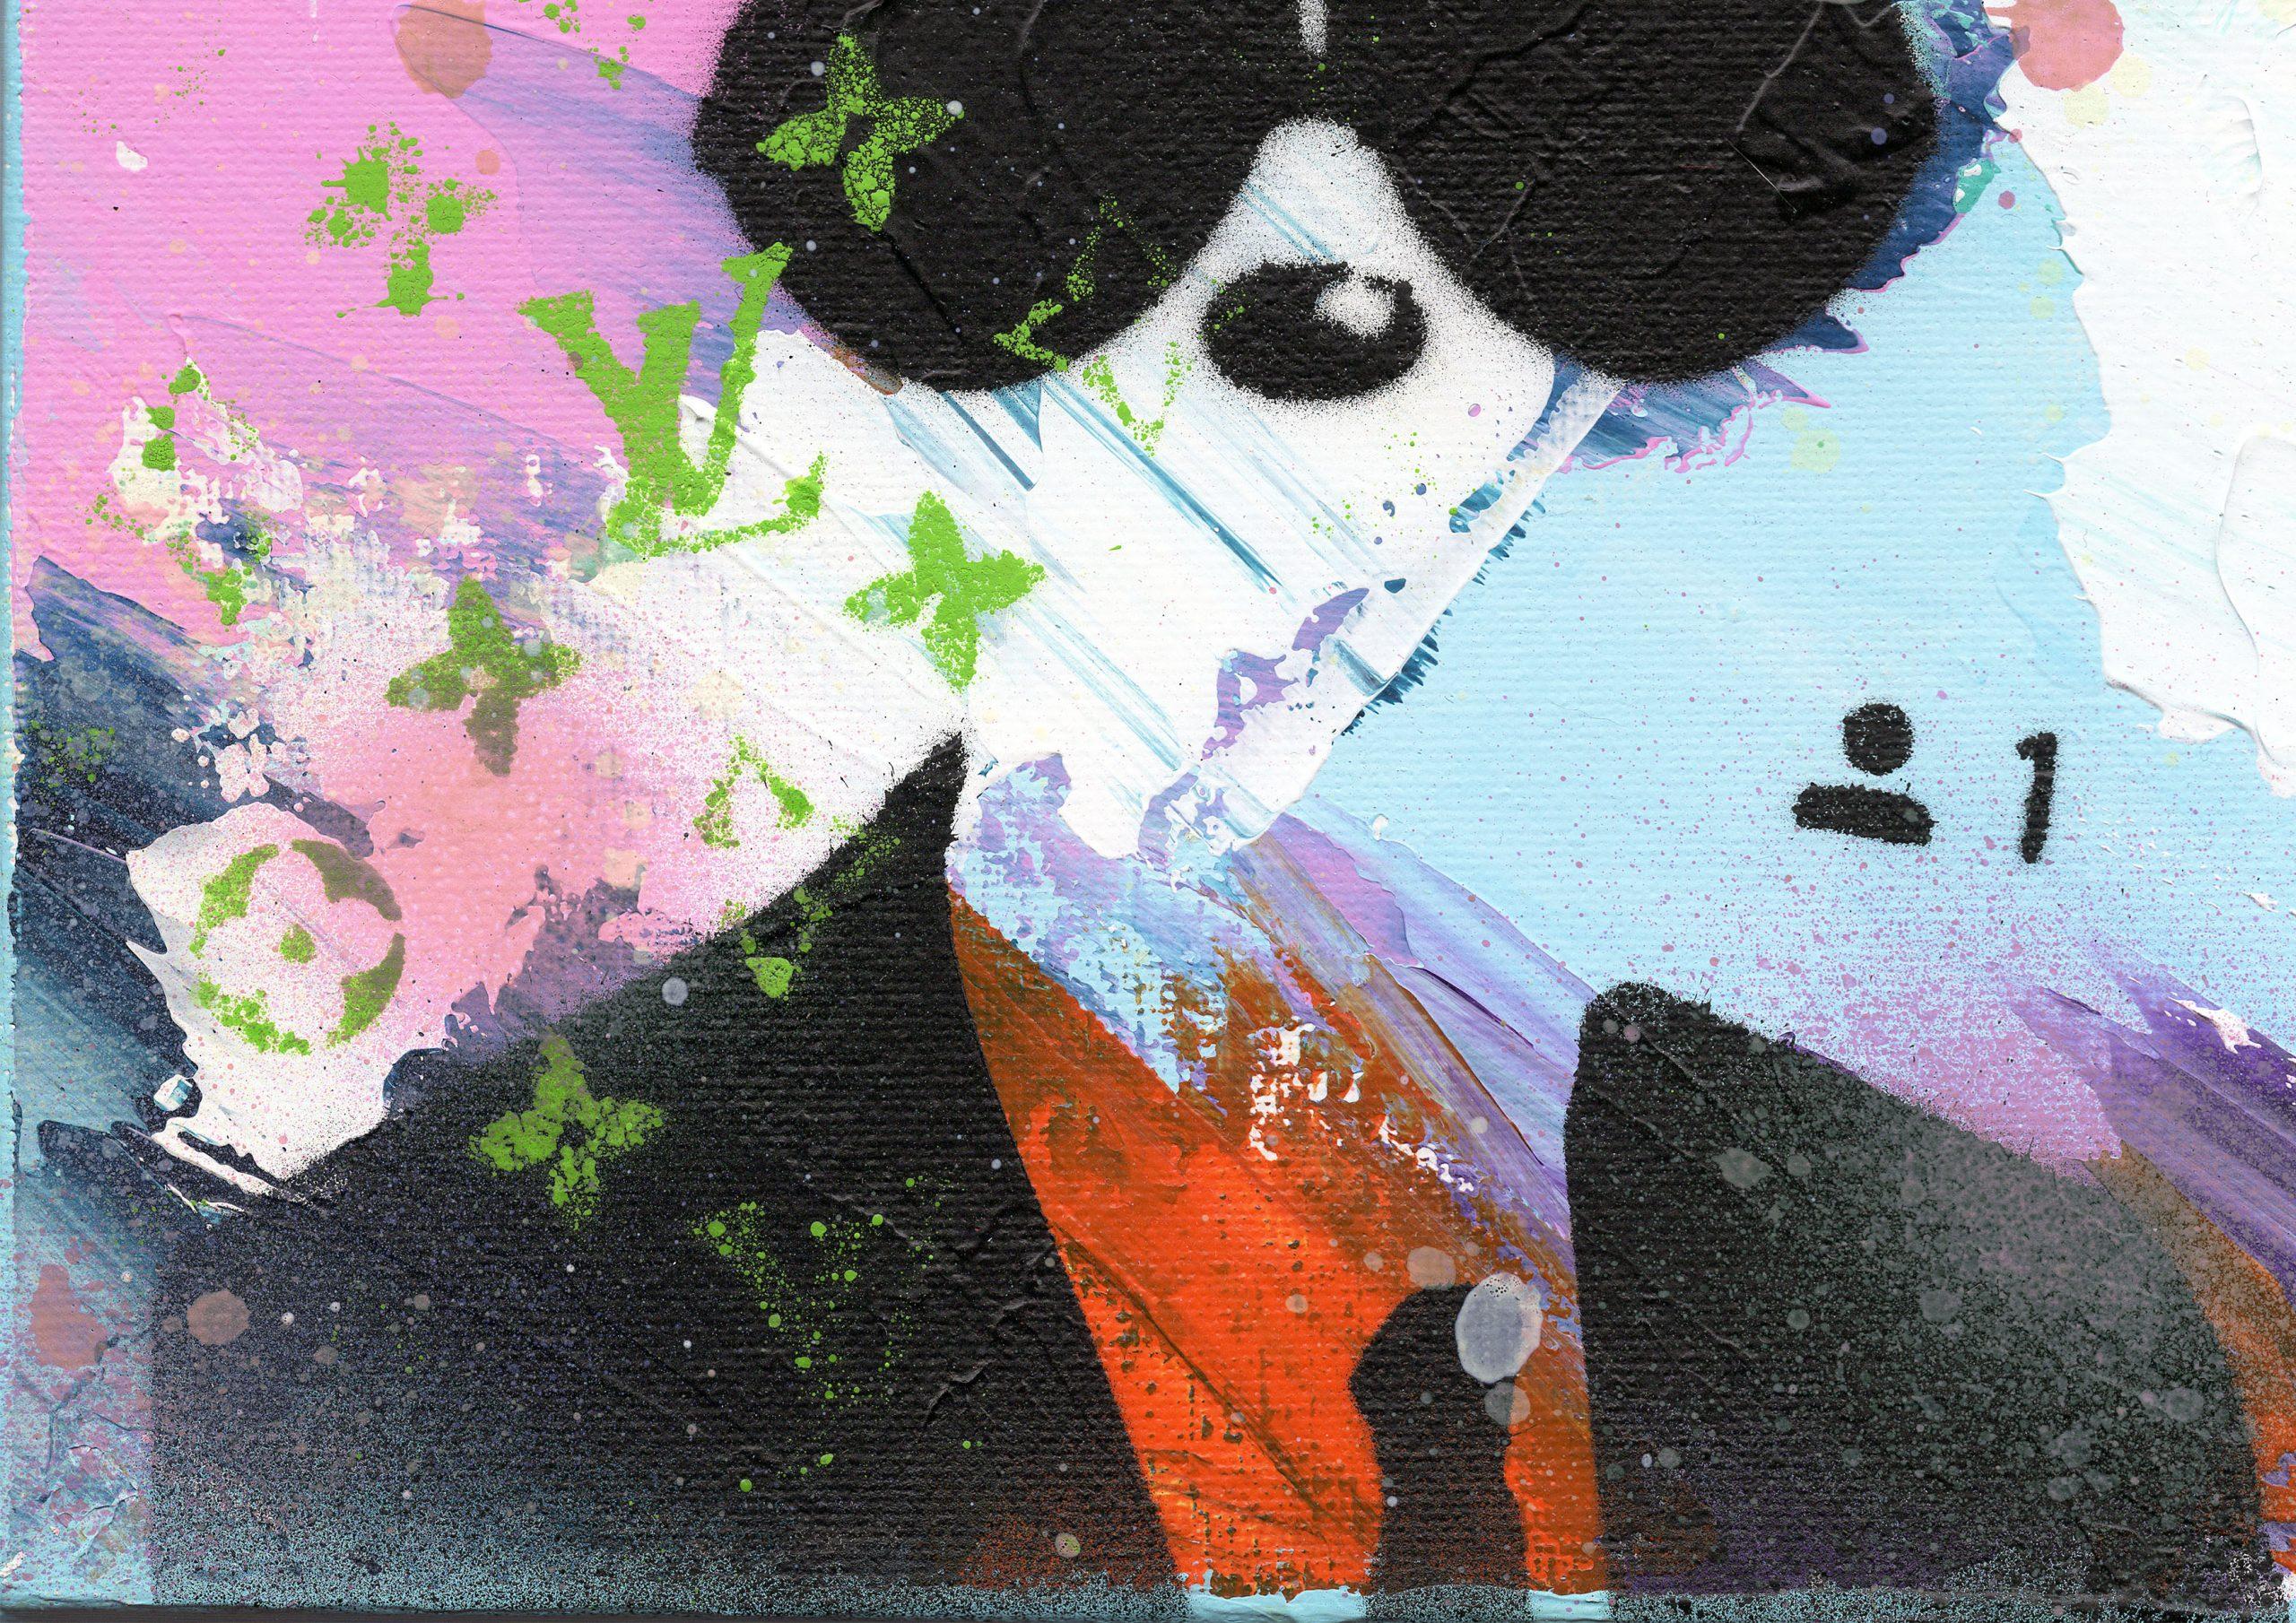 NATALIE-OTALORA-ART-GRAFFITI-MICKEY WANTS TO BE YOUR FRIEND-DETAIL2